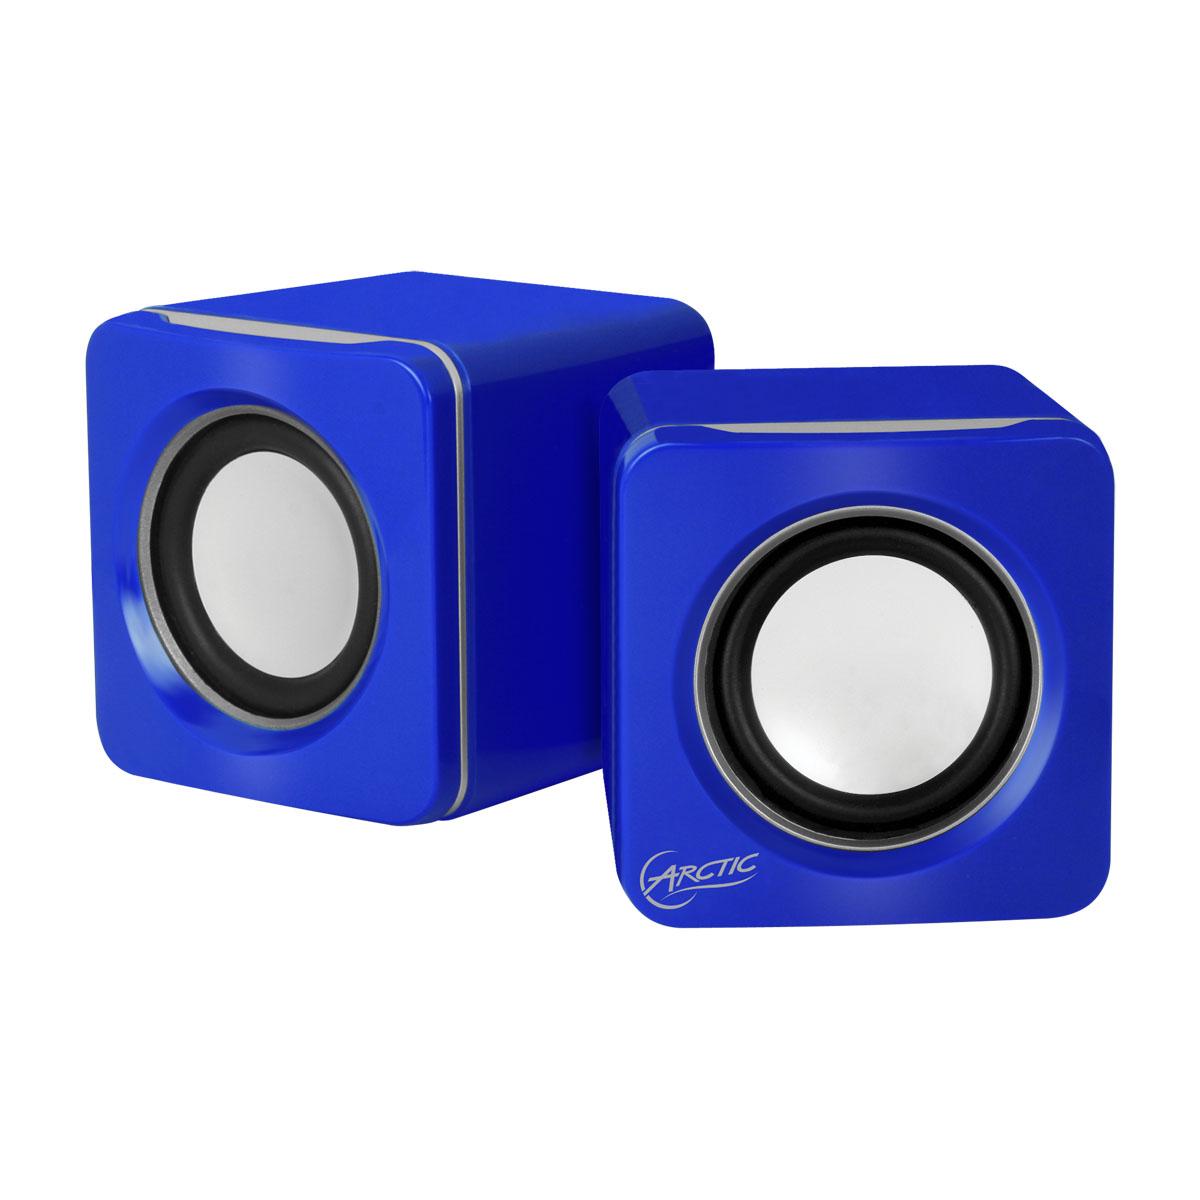 Arctic S111 M blue (SPASO-SP008BL-GBA01) T-MLX24946 akustiskā sistēma